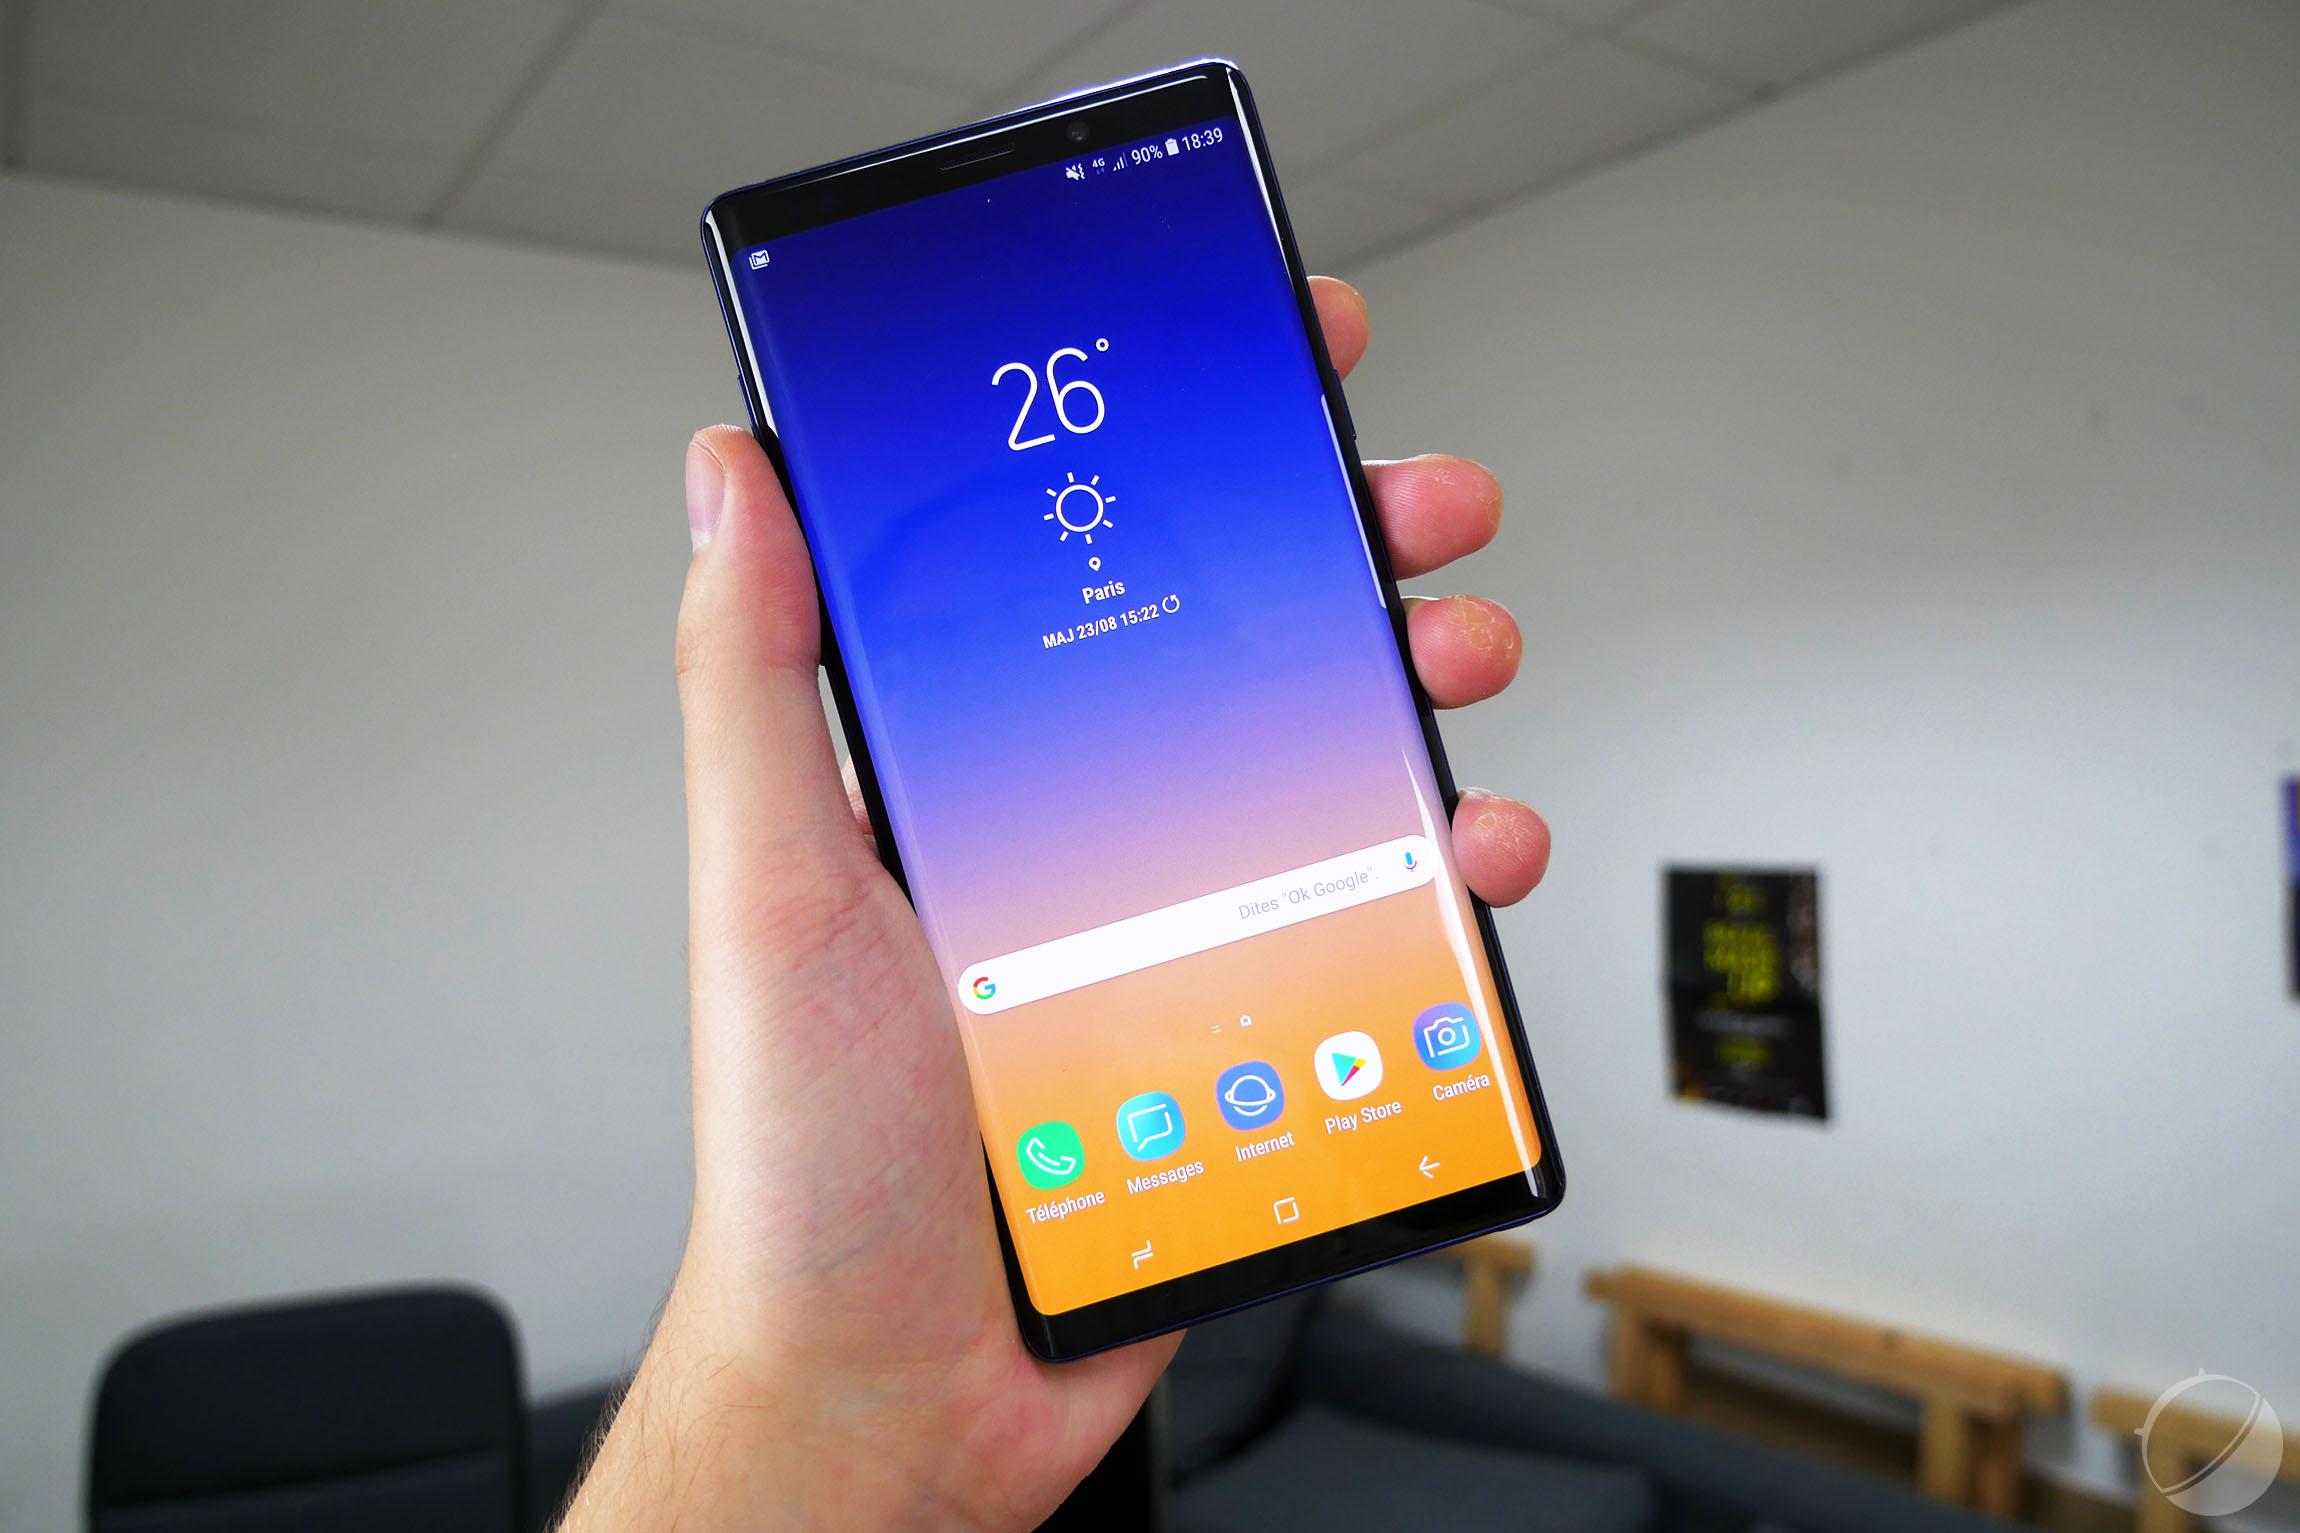 Samsung Galaxy Note 9  Android 10 arrive surveillez votre smartphone